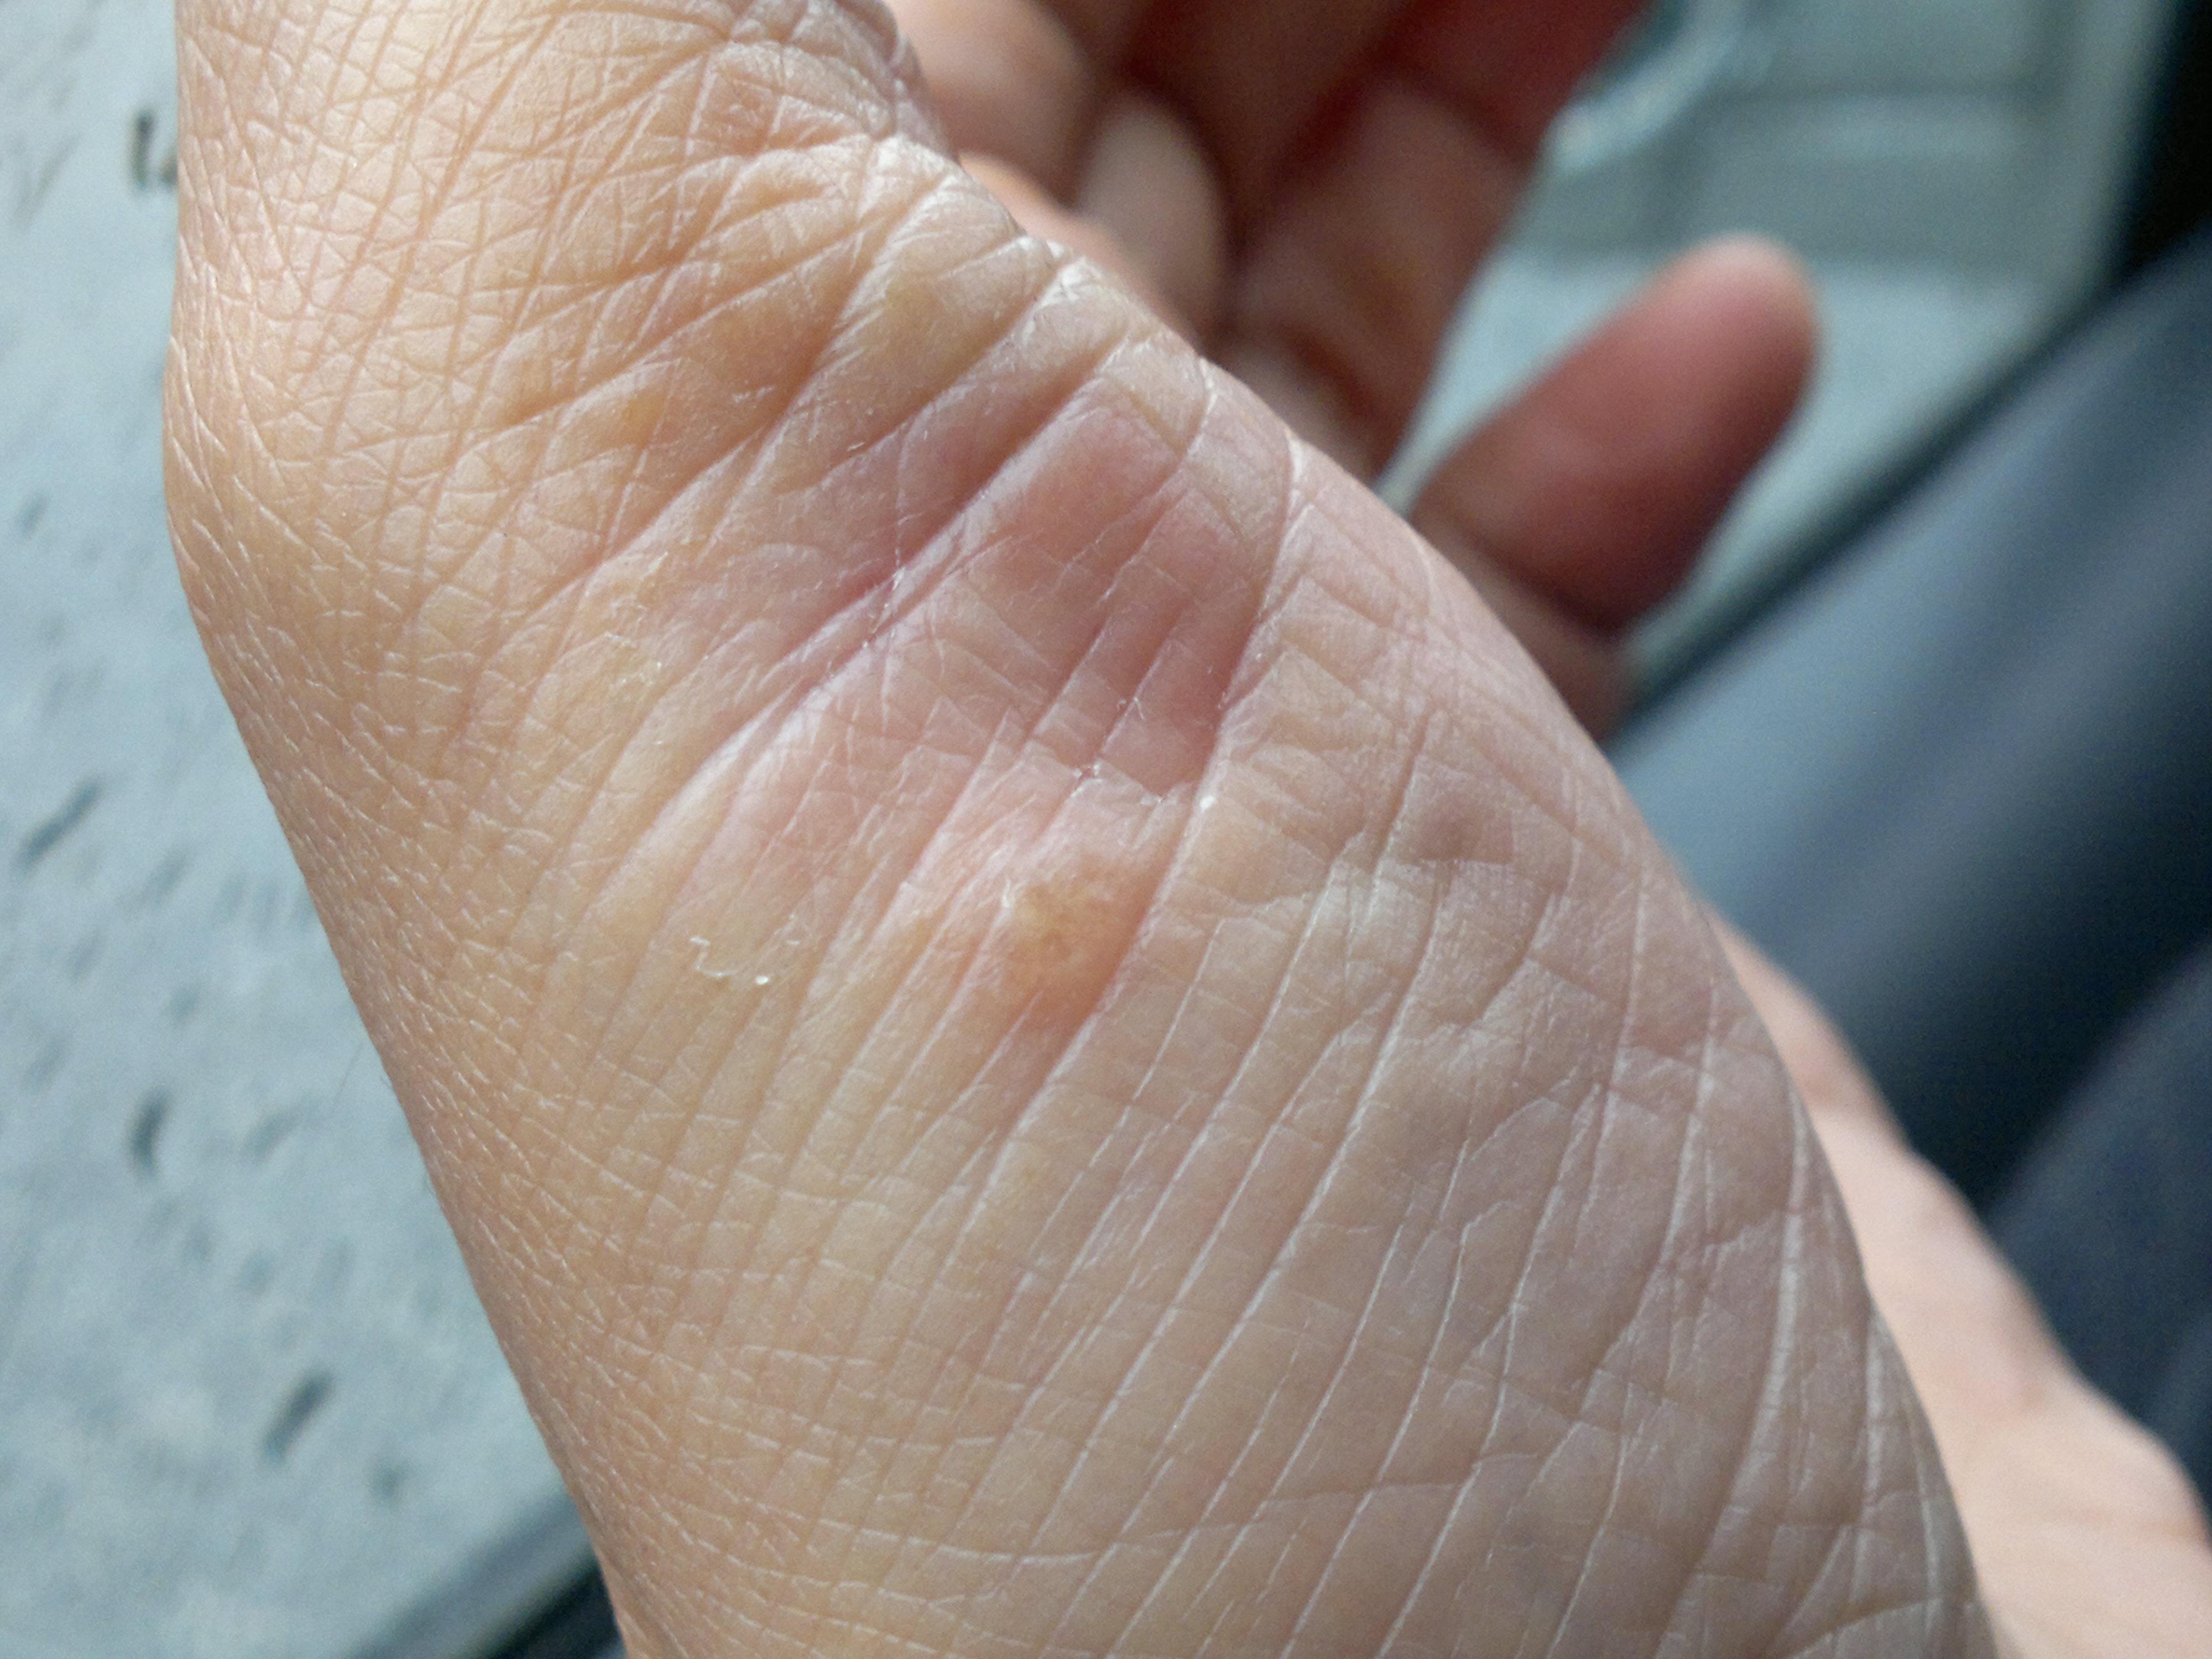 palmoplantar pustulosis icd 10